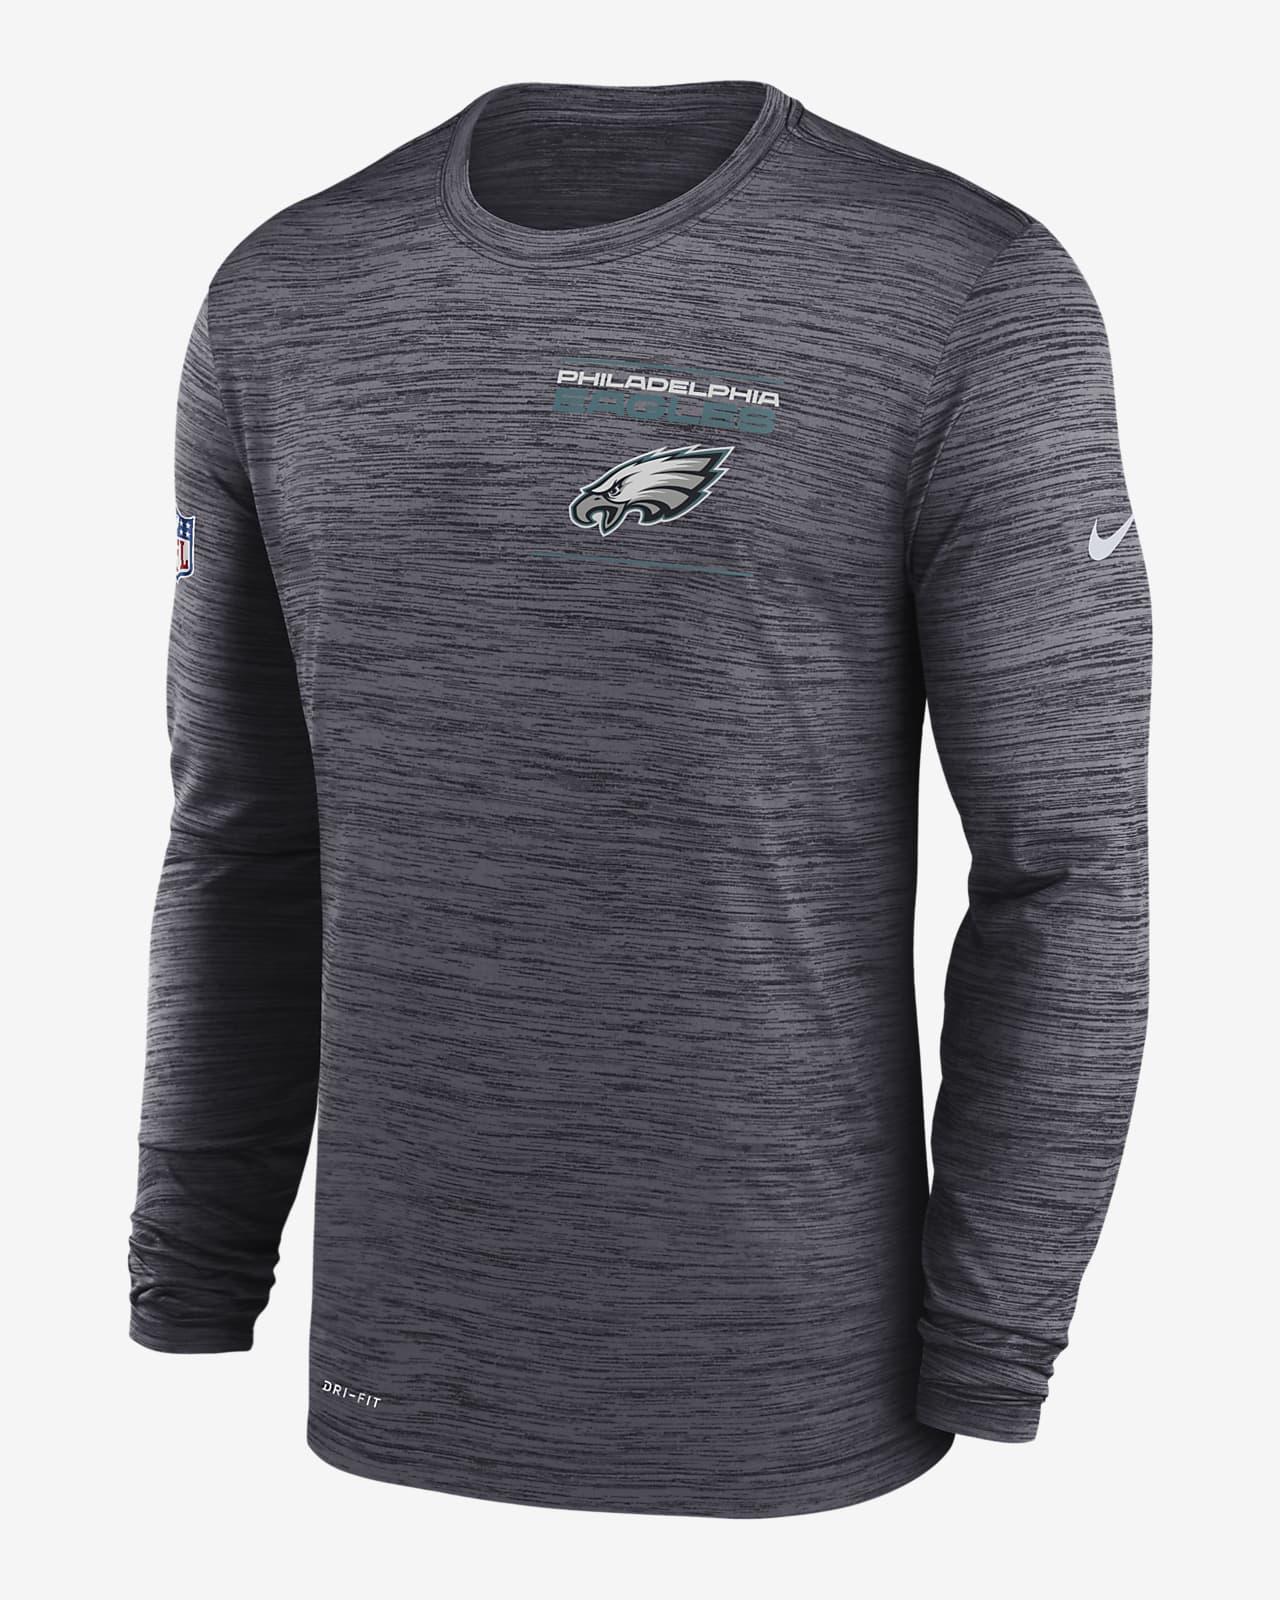 Nike Dri-FIT Sideline Velocity Legend (NFL Philadelphia Eagles) Men's Long-Sleeve T-Shirt